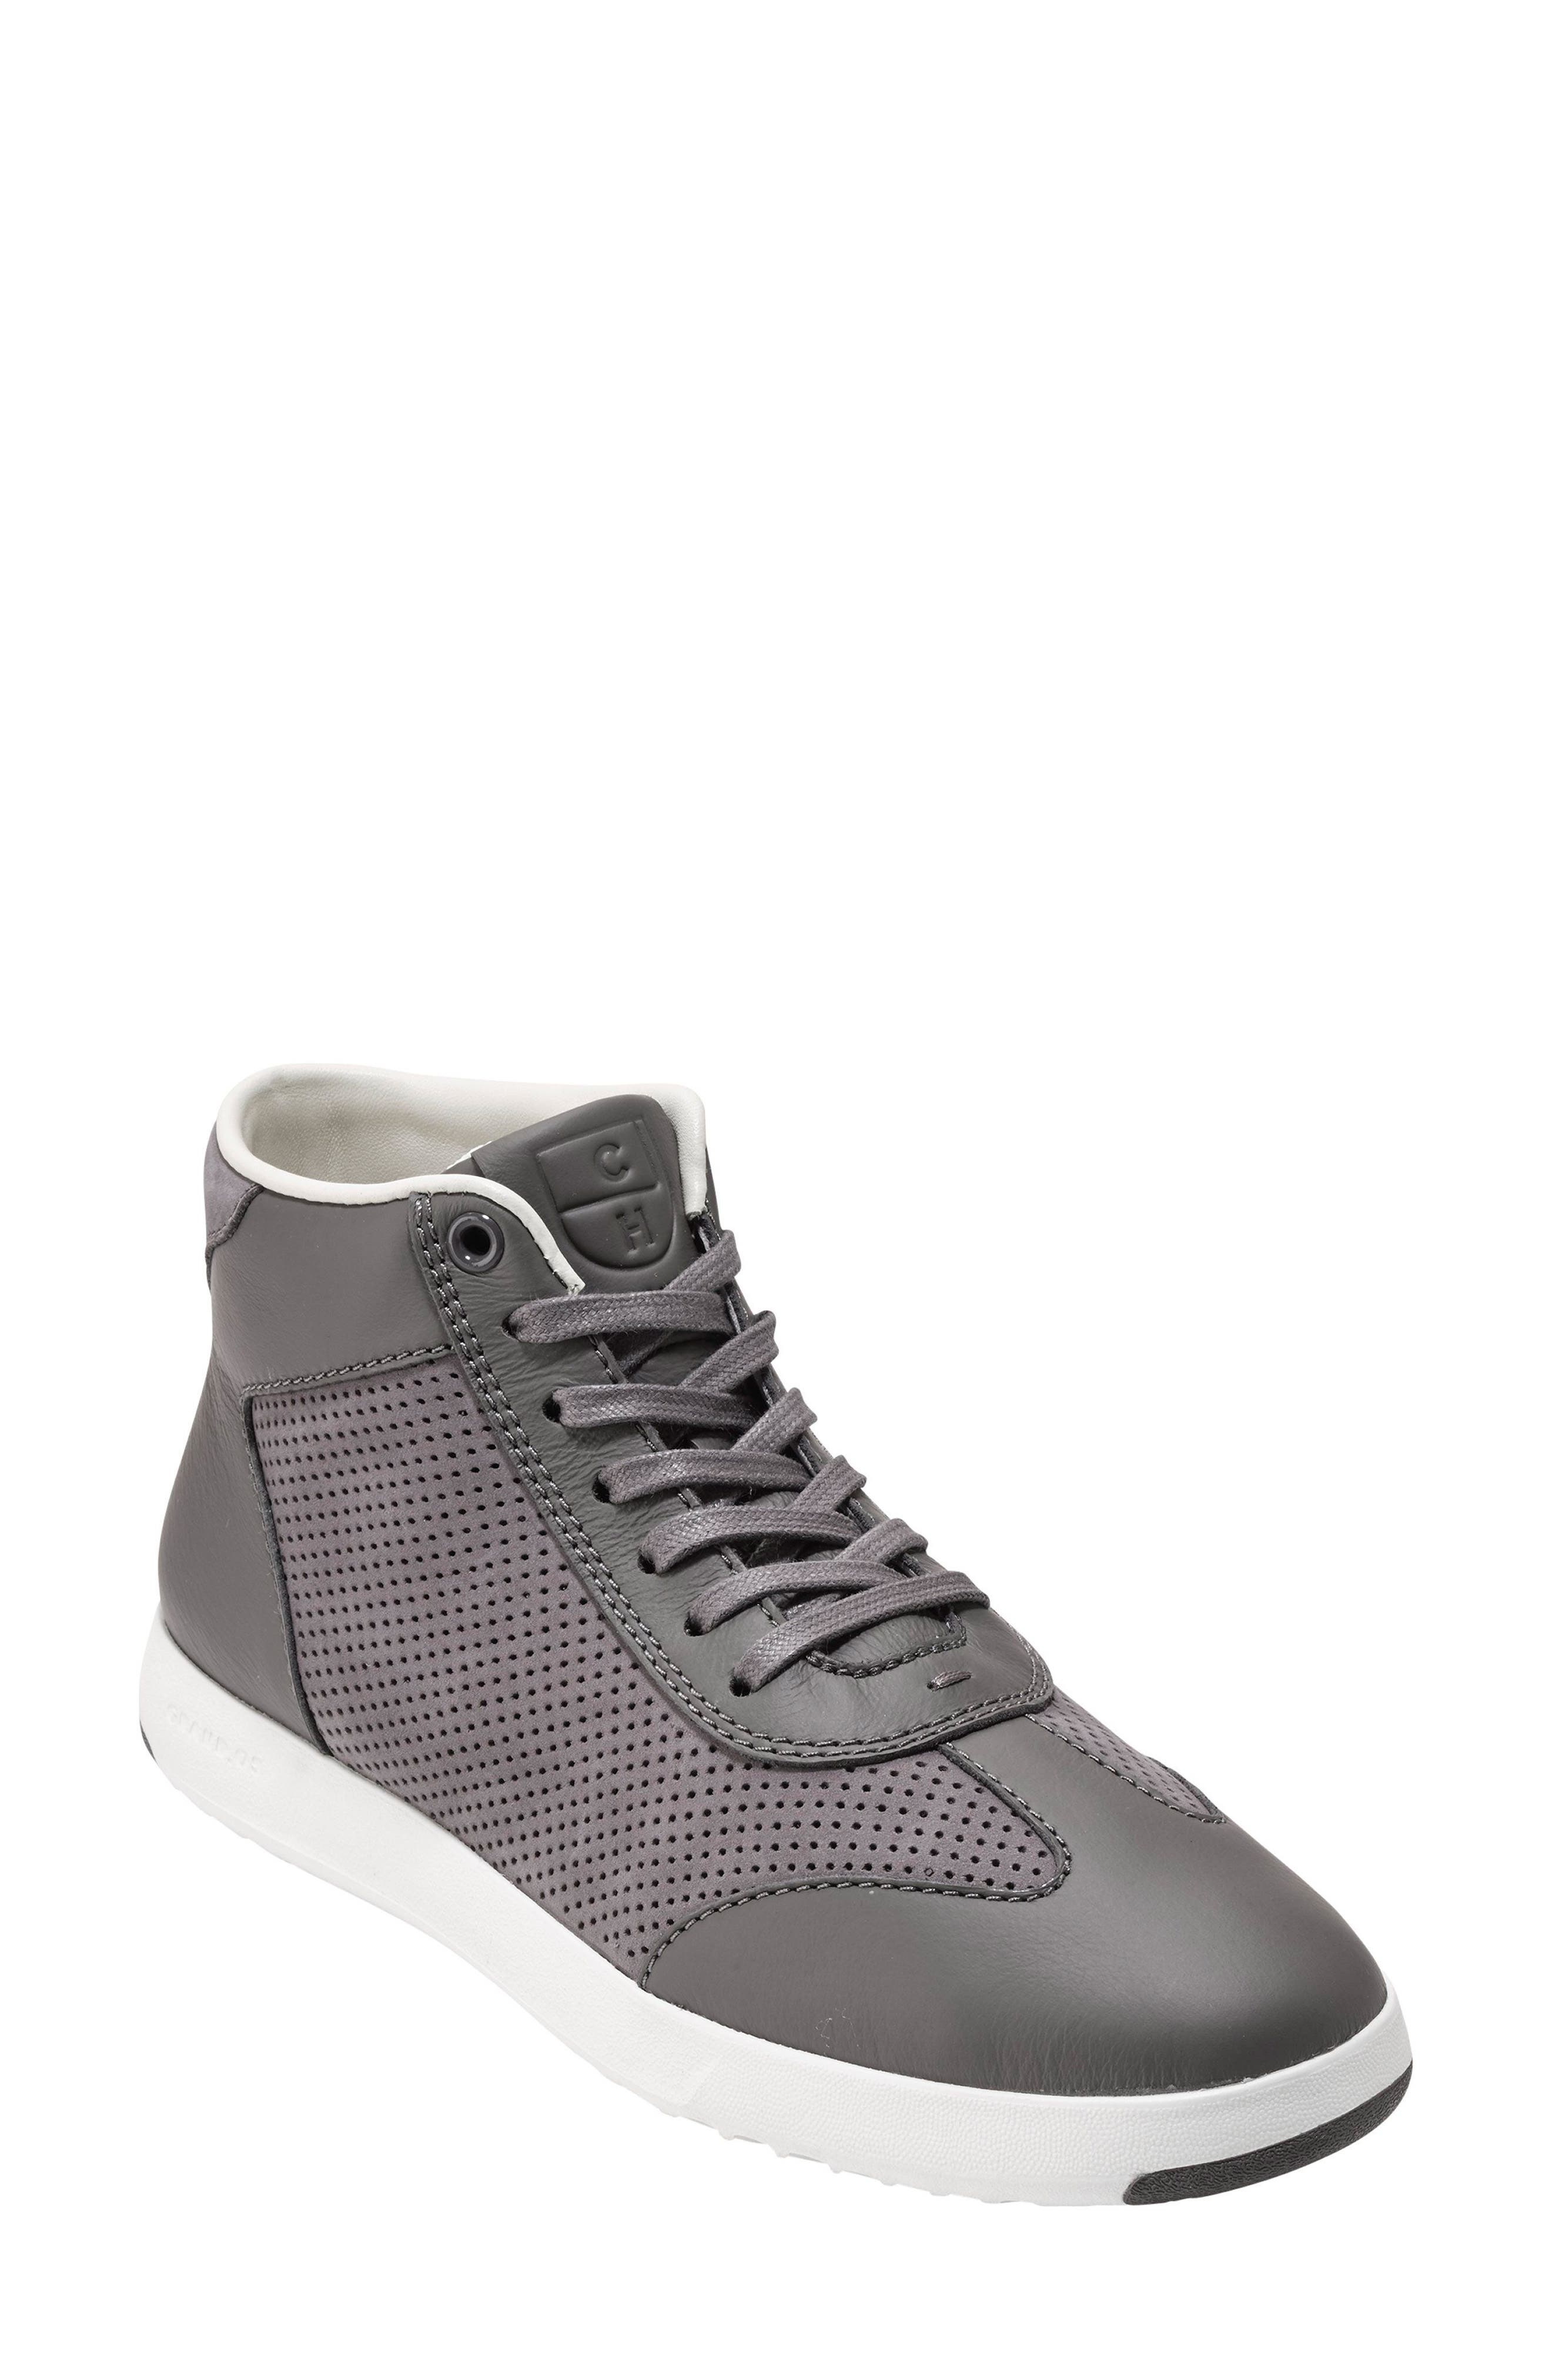 GrandPro High Top Sneaker,                             Main thumbnail 1, color,                             025